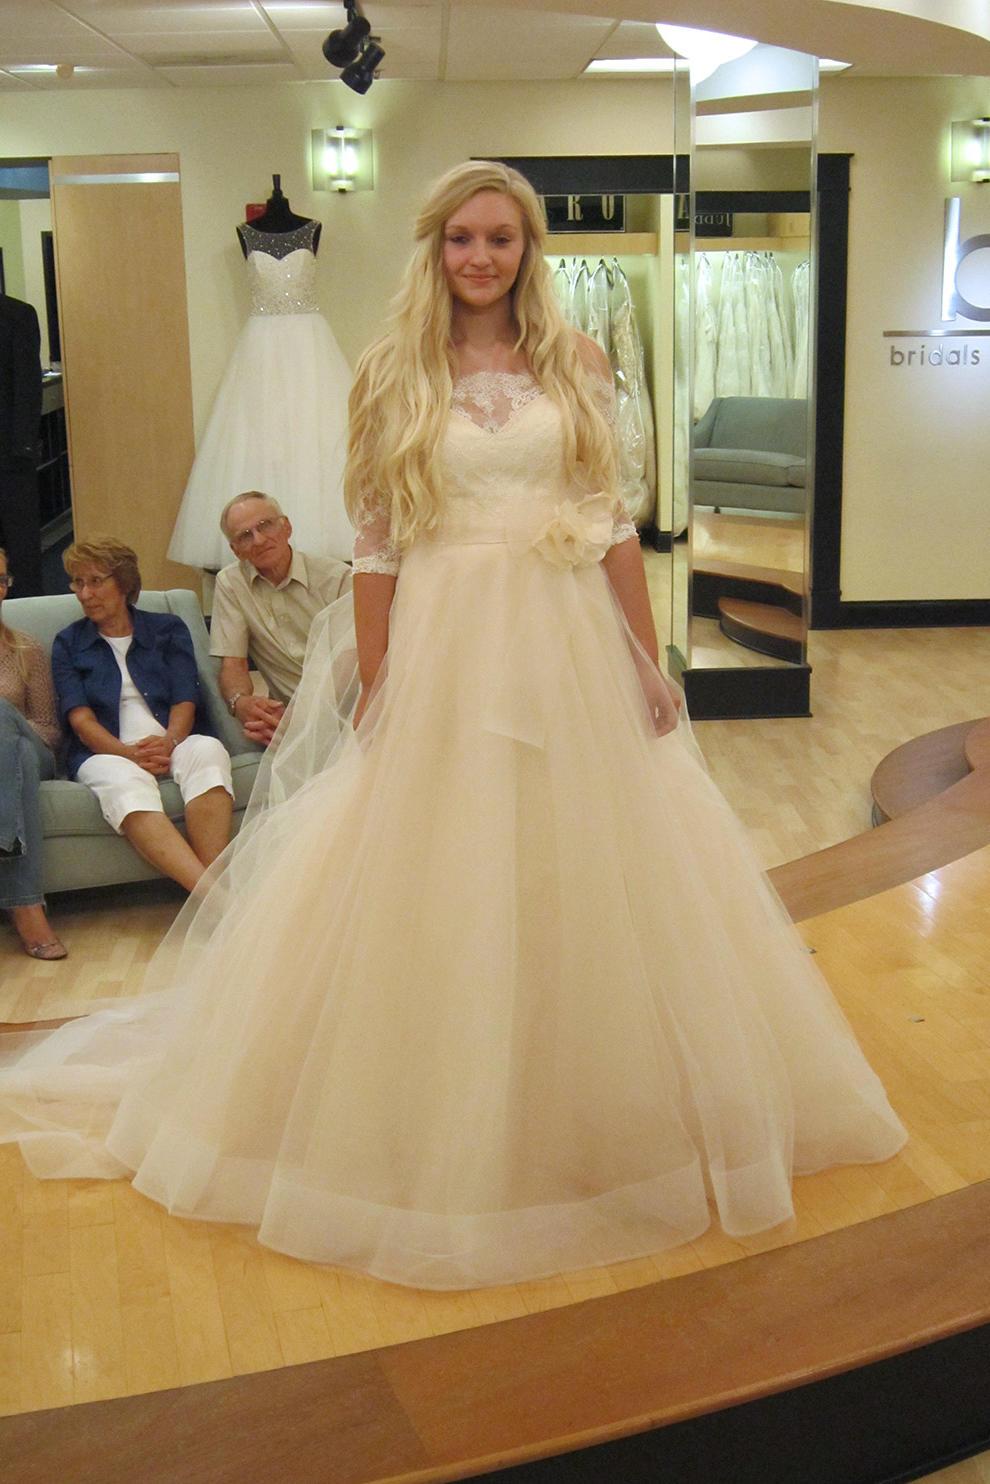 Atlanta Wedding Dress Featured Wedding Dresses Part 4 Say Yes To The Dress Atlanta TLC